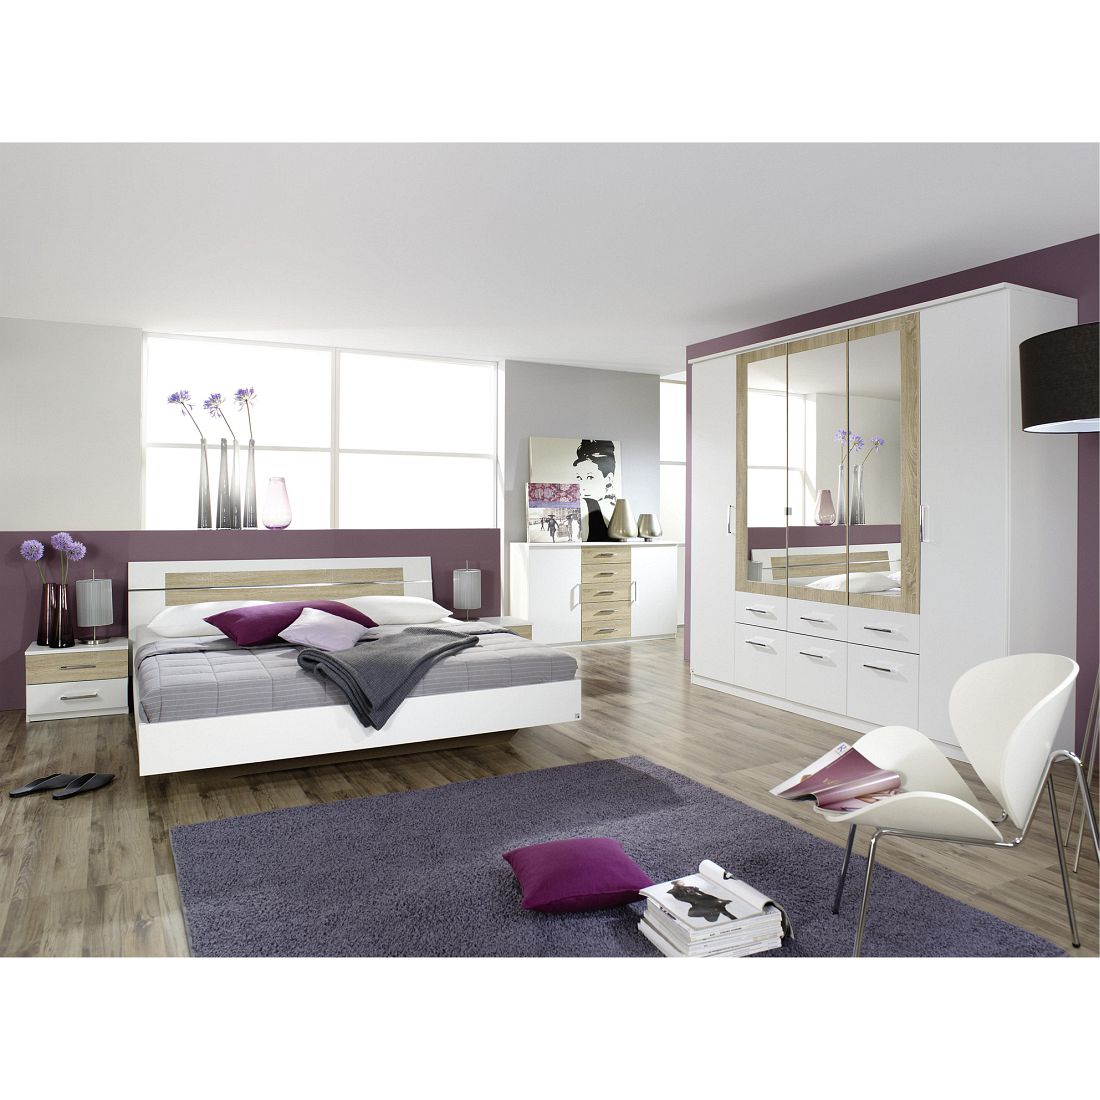 Slaapkamer slaapkamersets